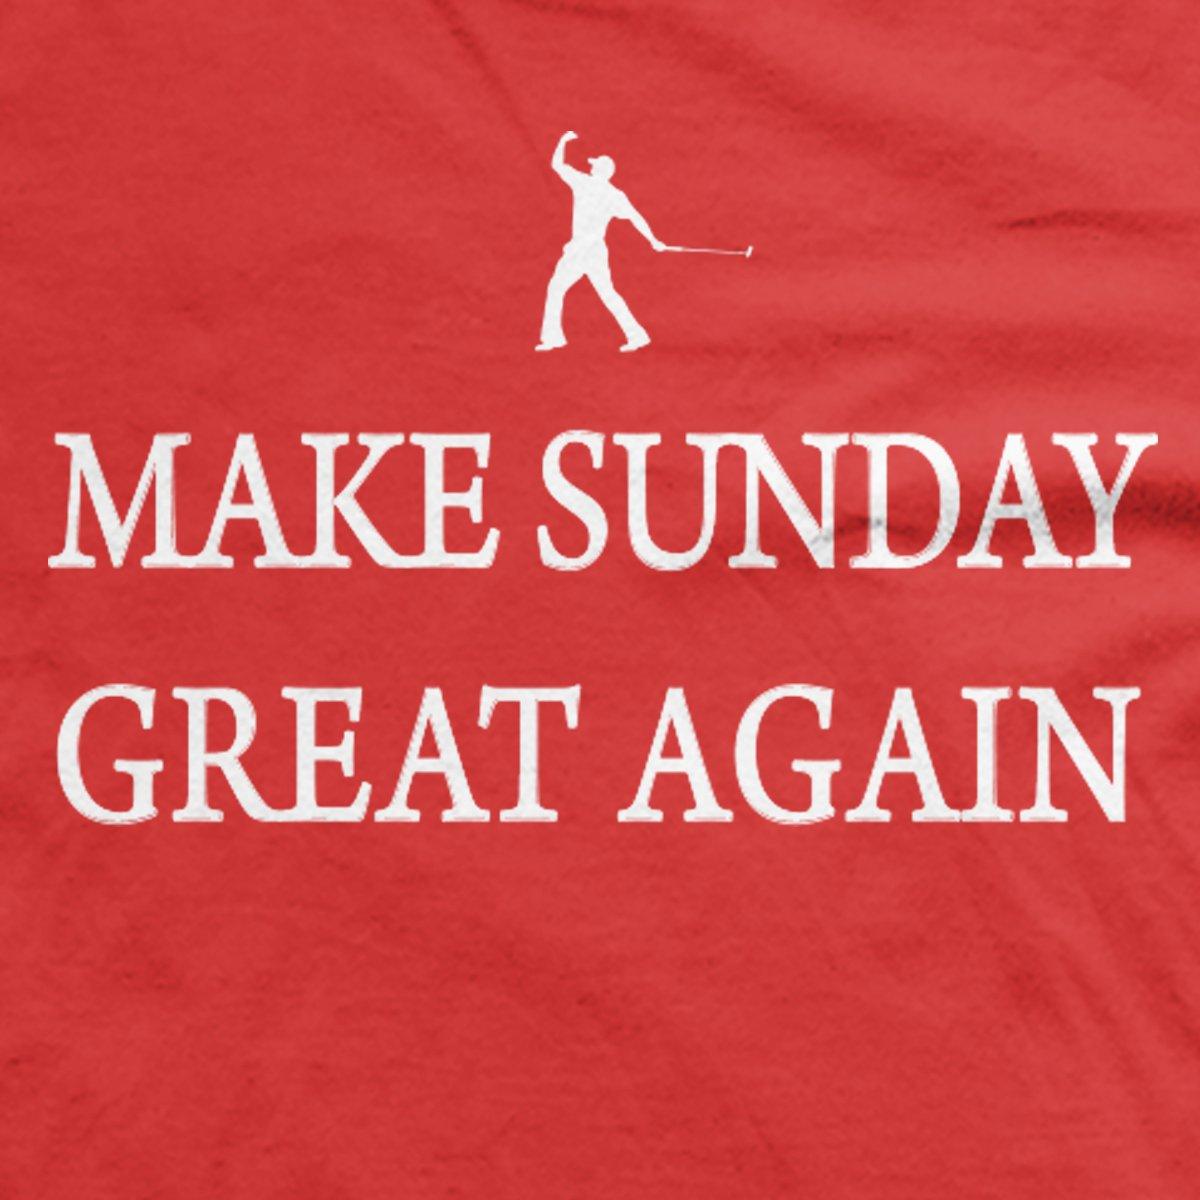 Make Sunday Great Again